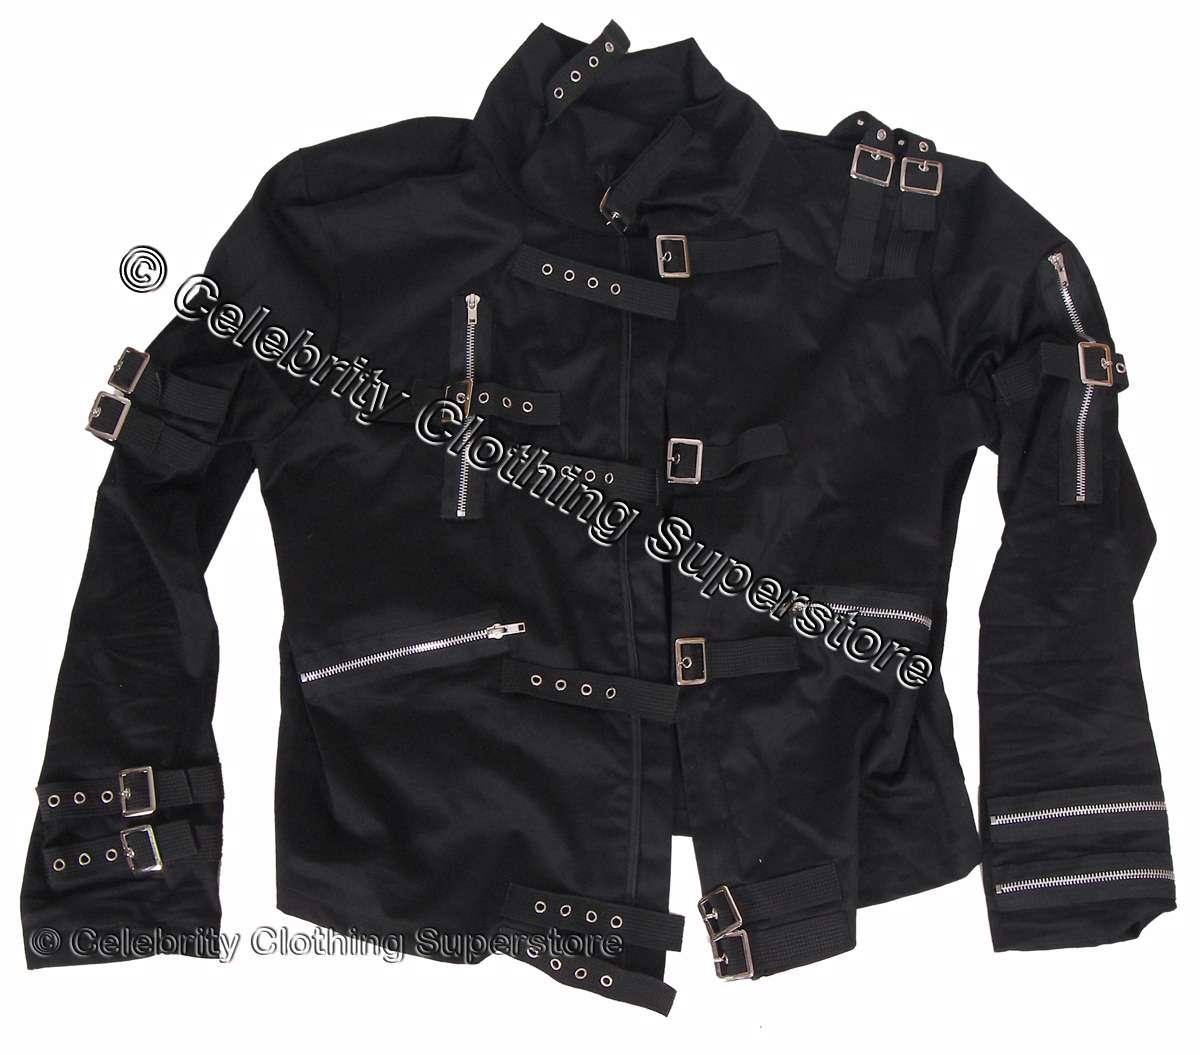 http://www.michaeljacksoncelebrityclothing.com/MJ-Pics/BAD/Michael-Jackson-Bad-Jacket.jpg